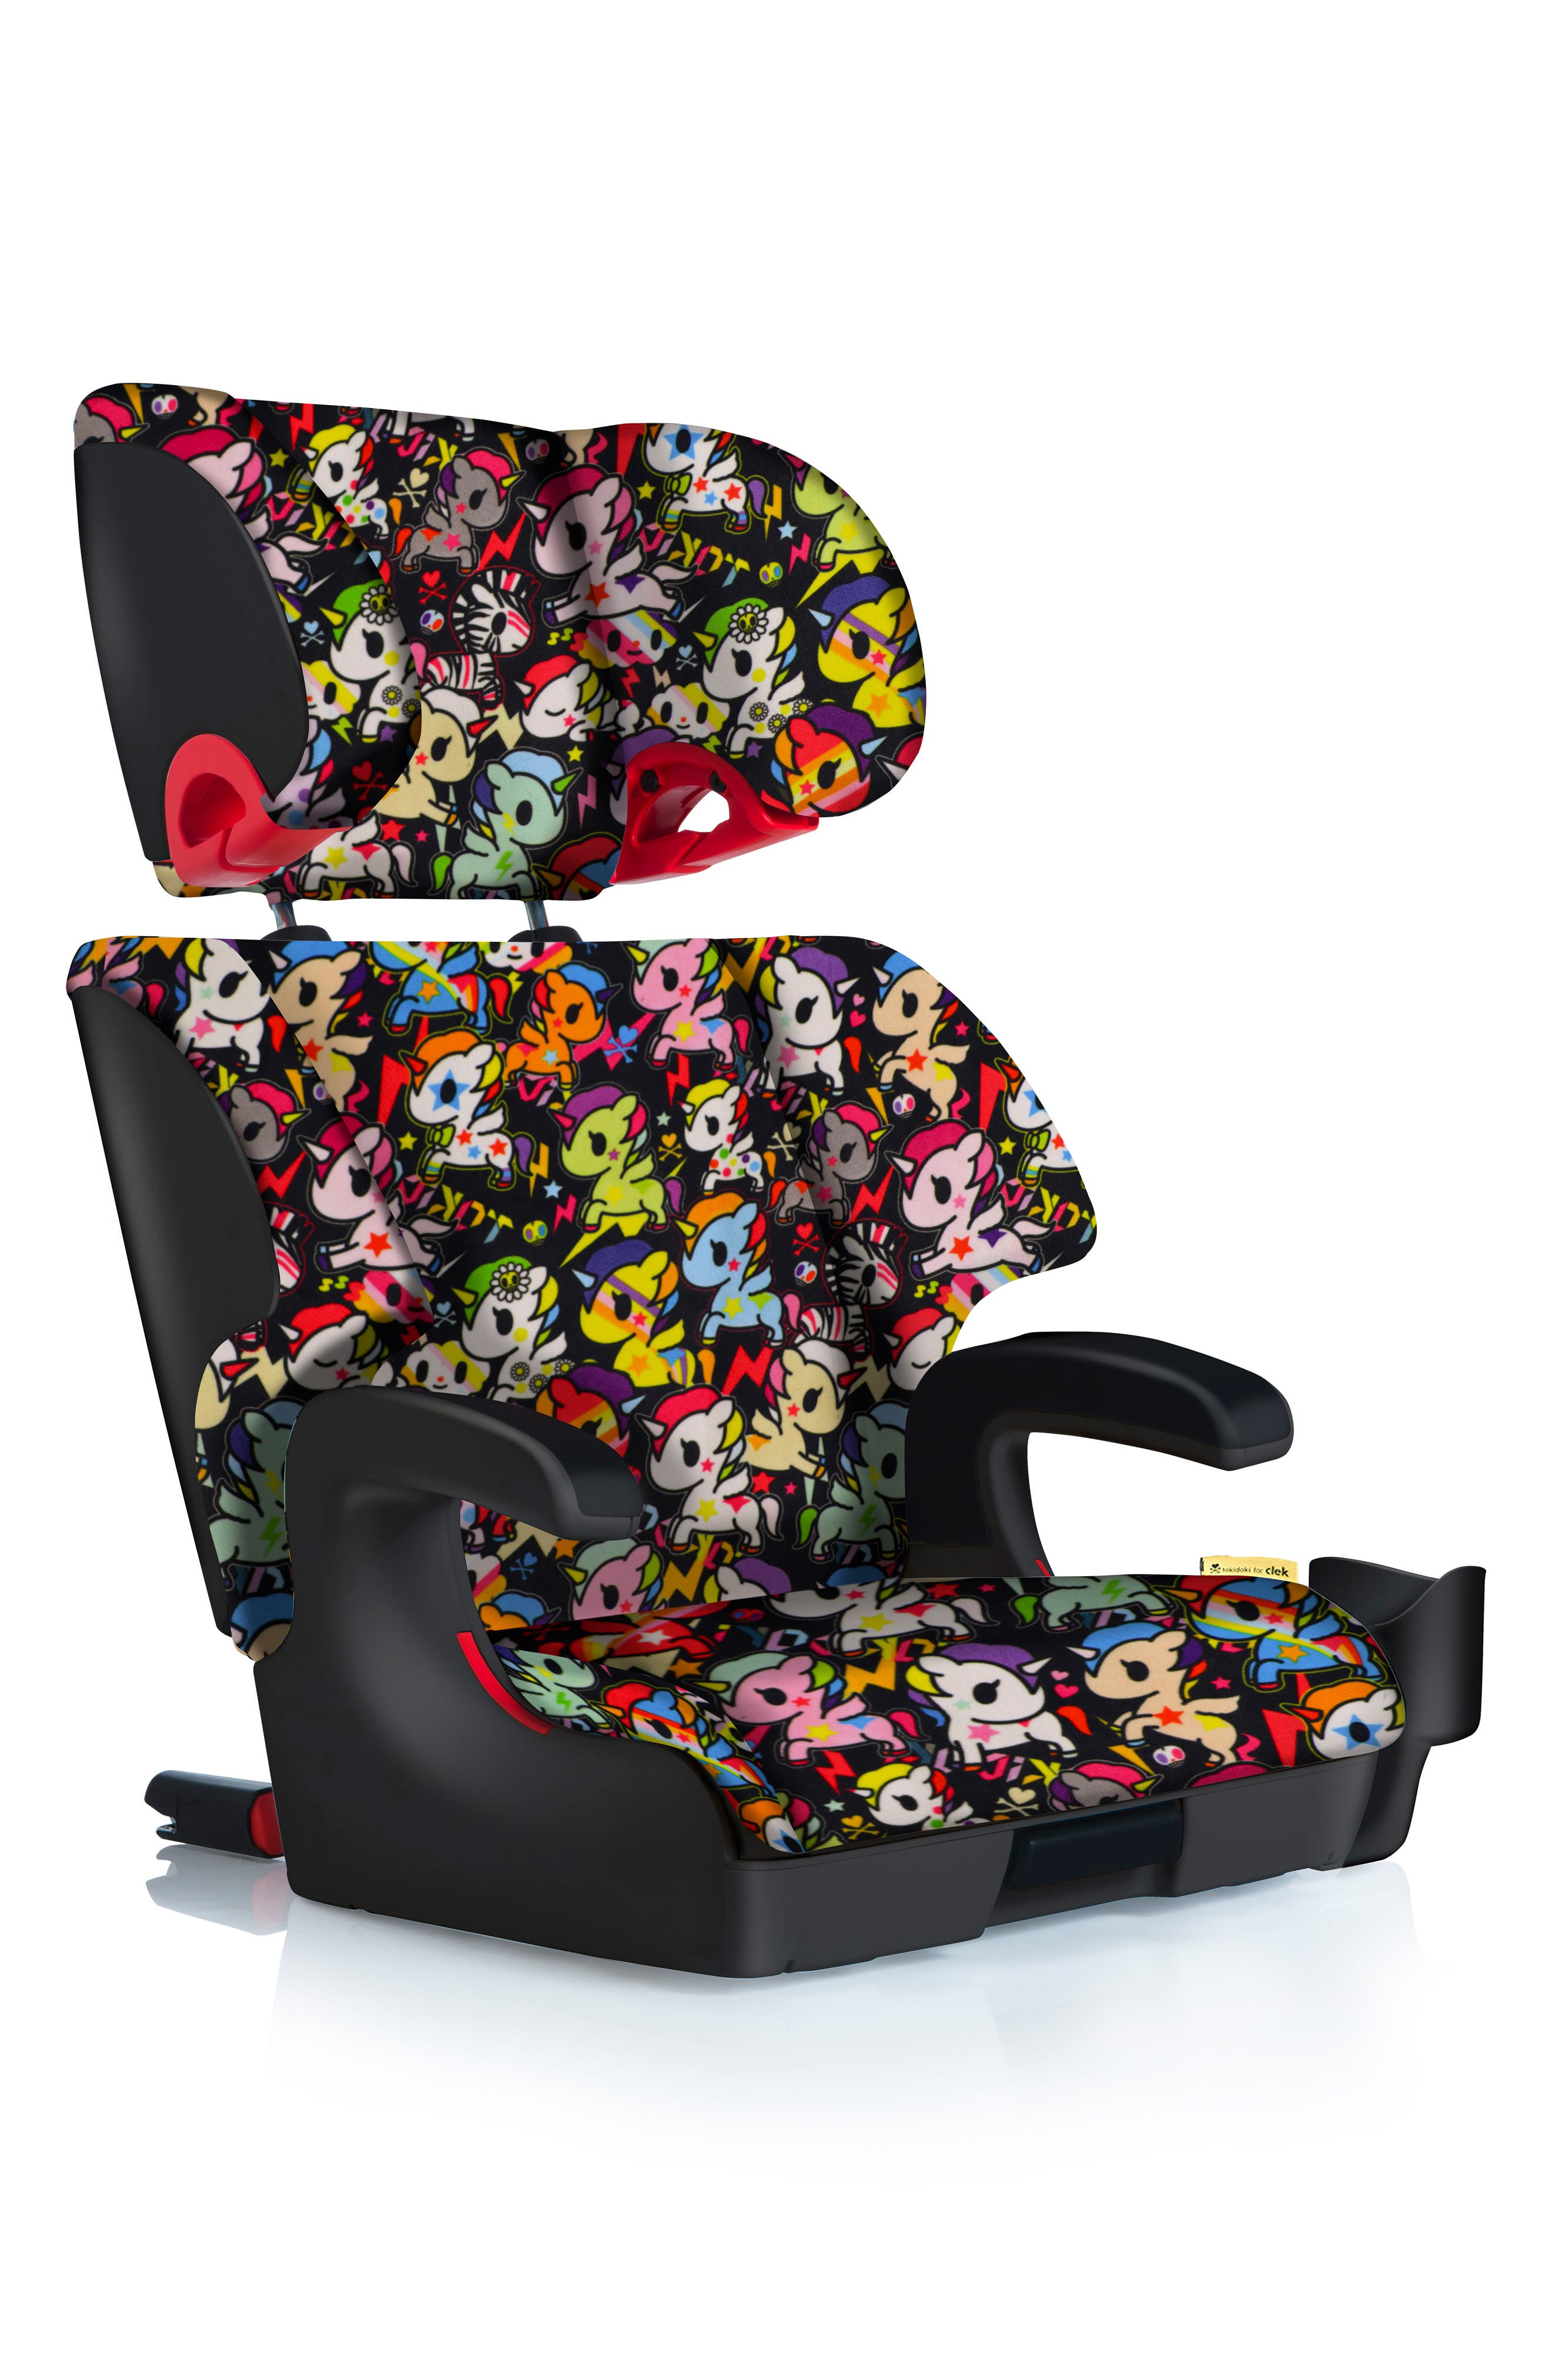 Clek x Tokidoki Oobr Convertible Full Back/Backless Booster Seat